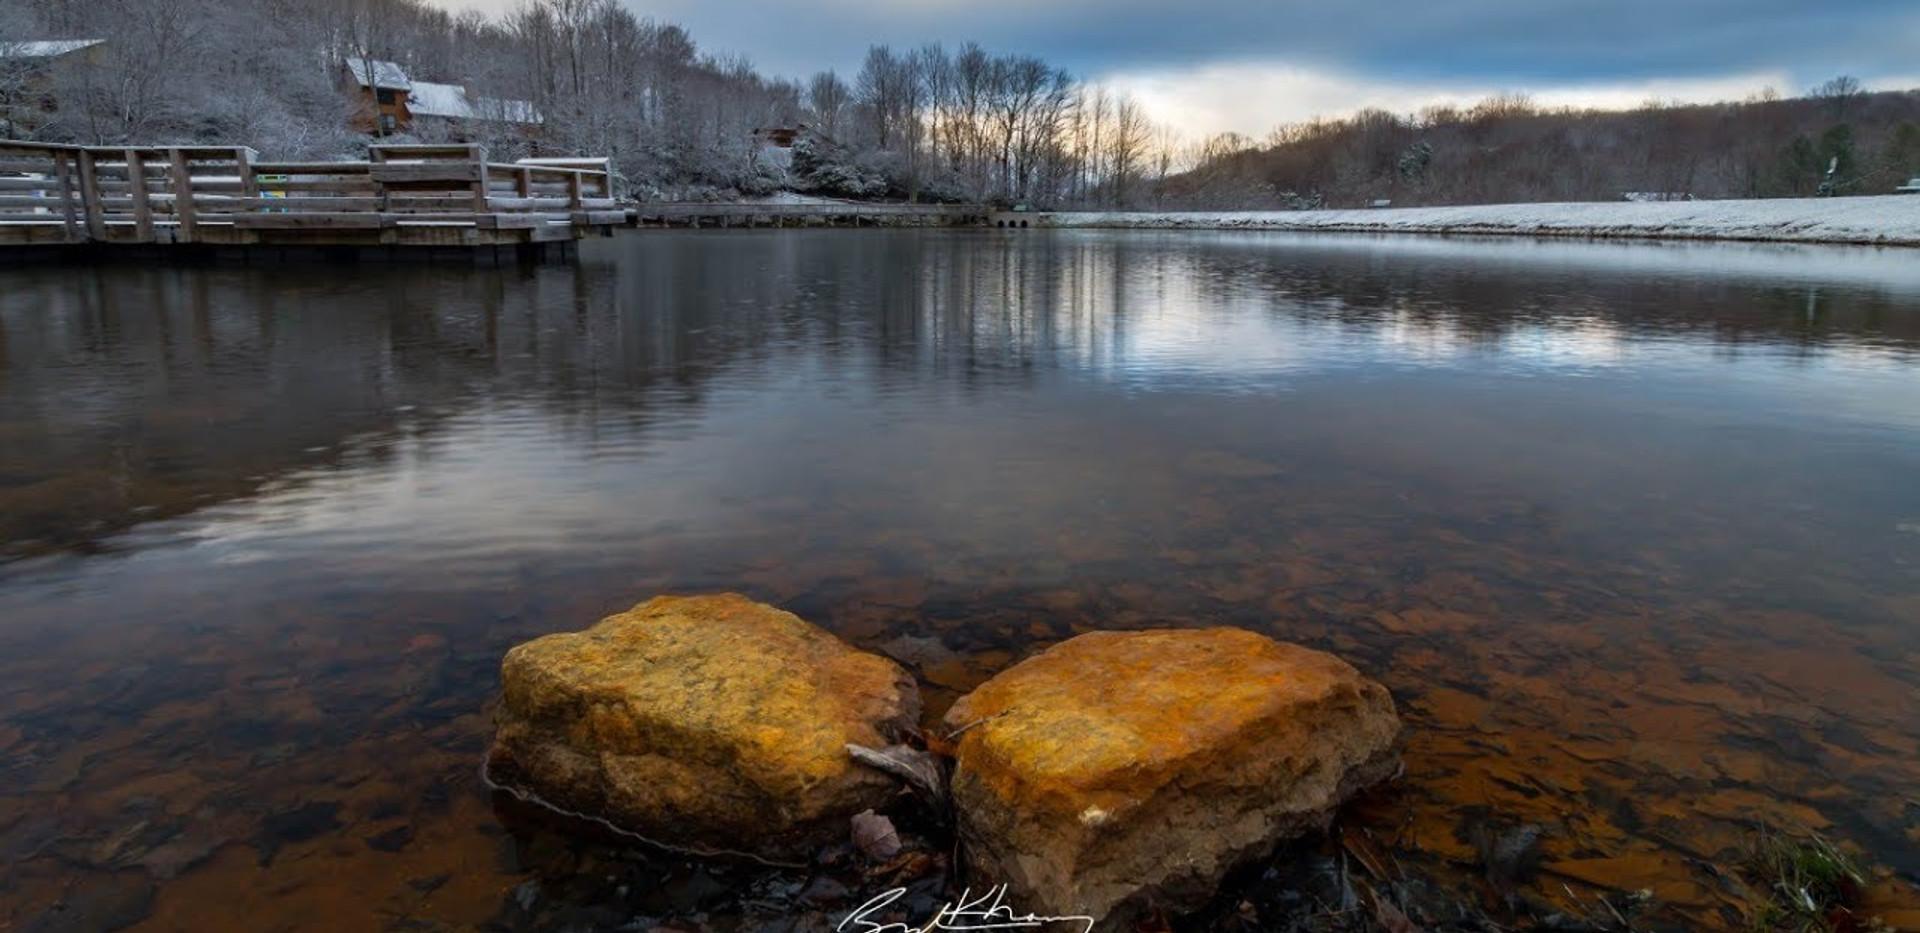 11-19-17 Beech Mountain, NC